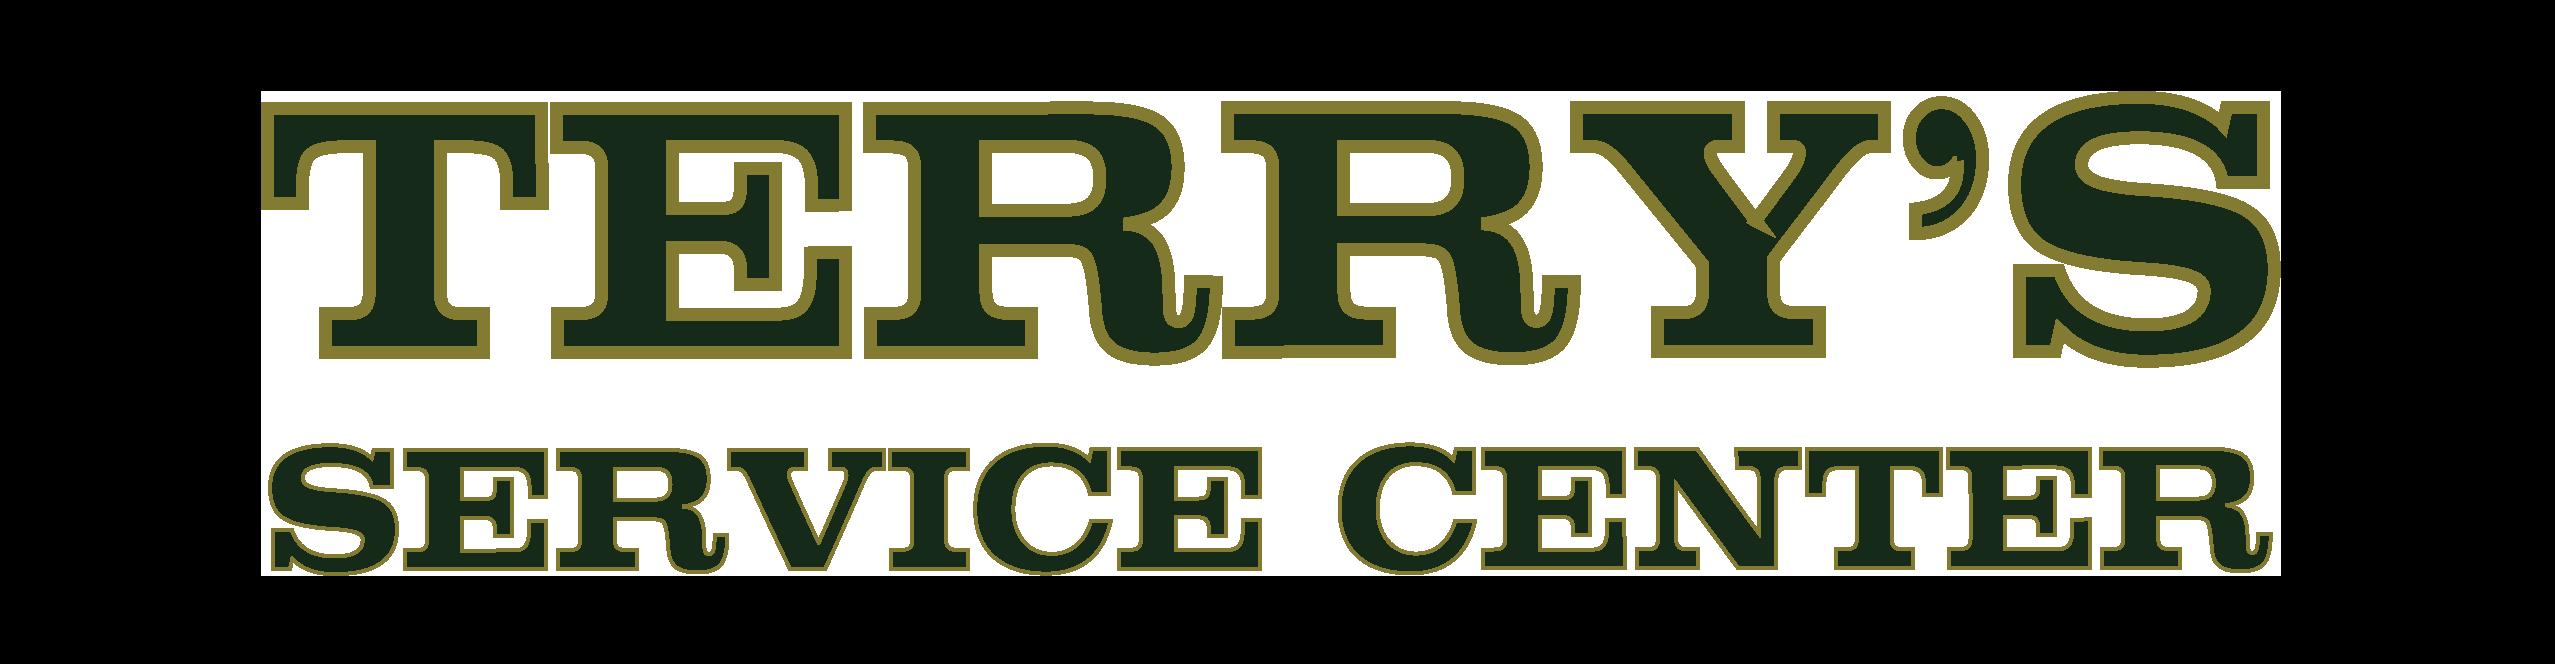 Terry's Service Center